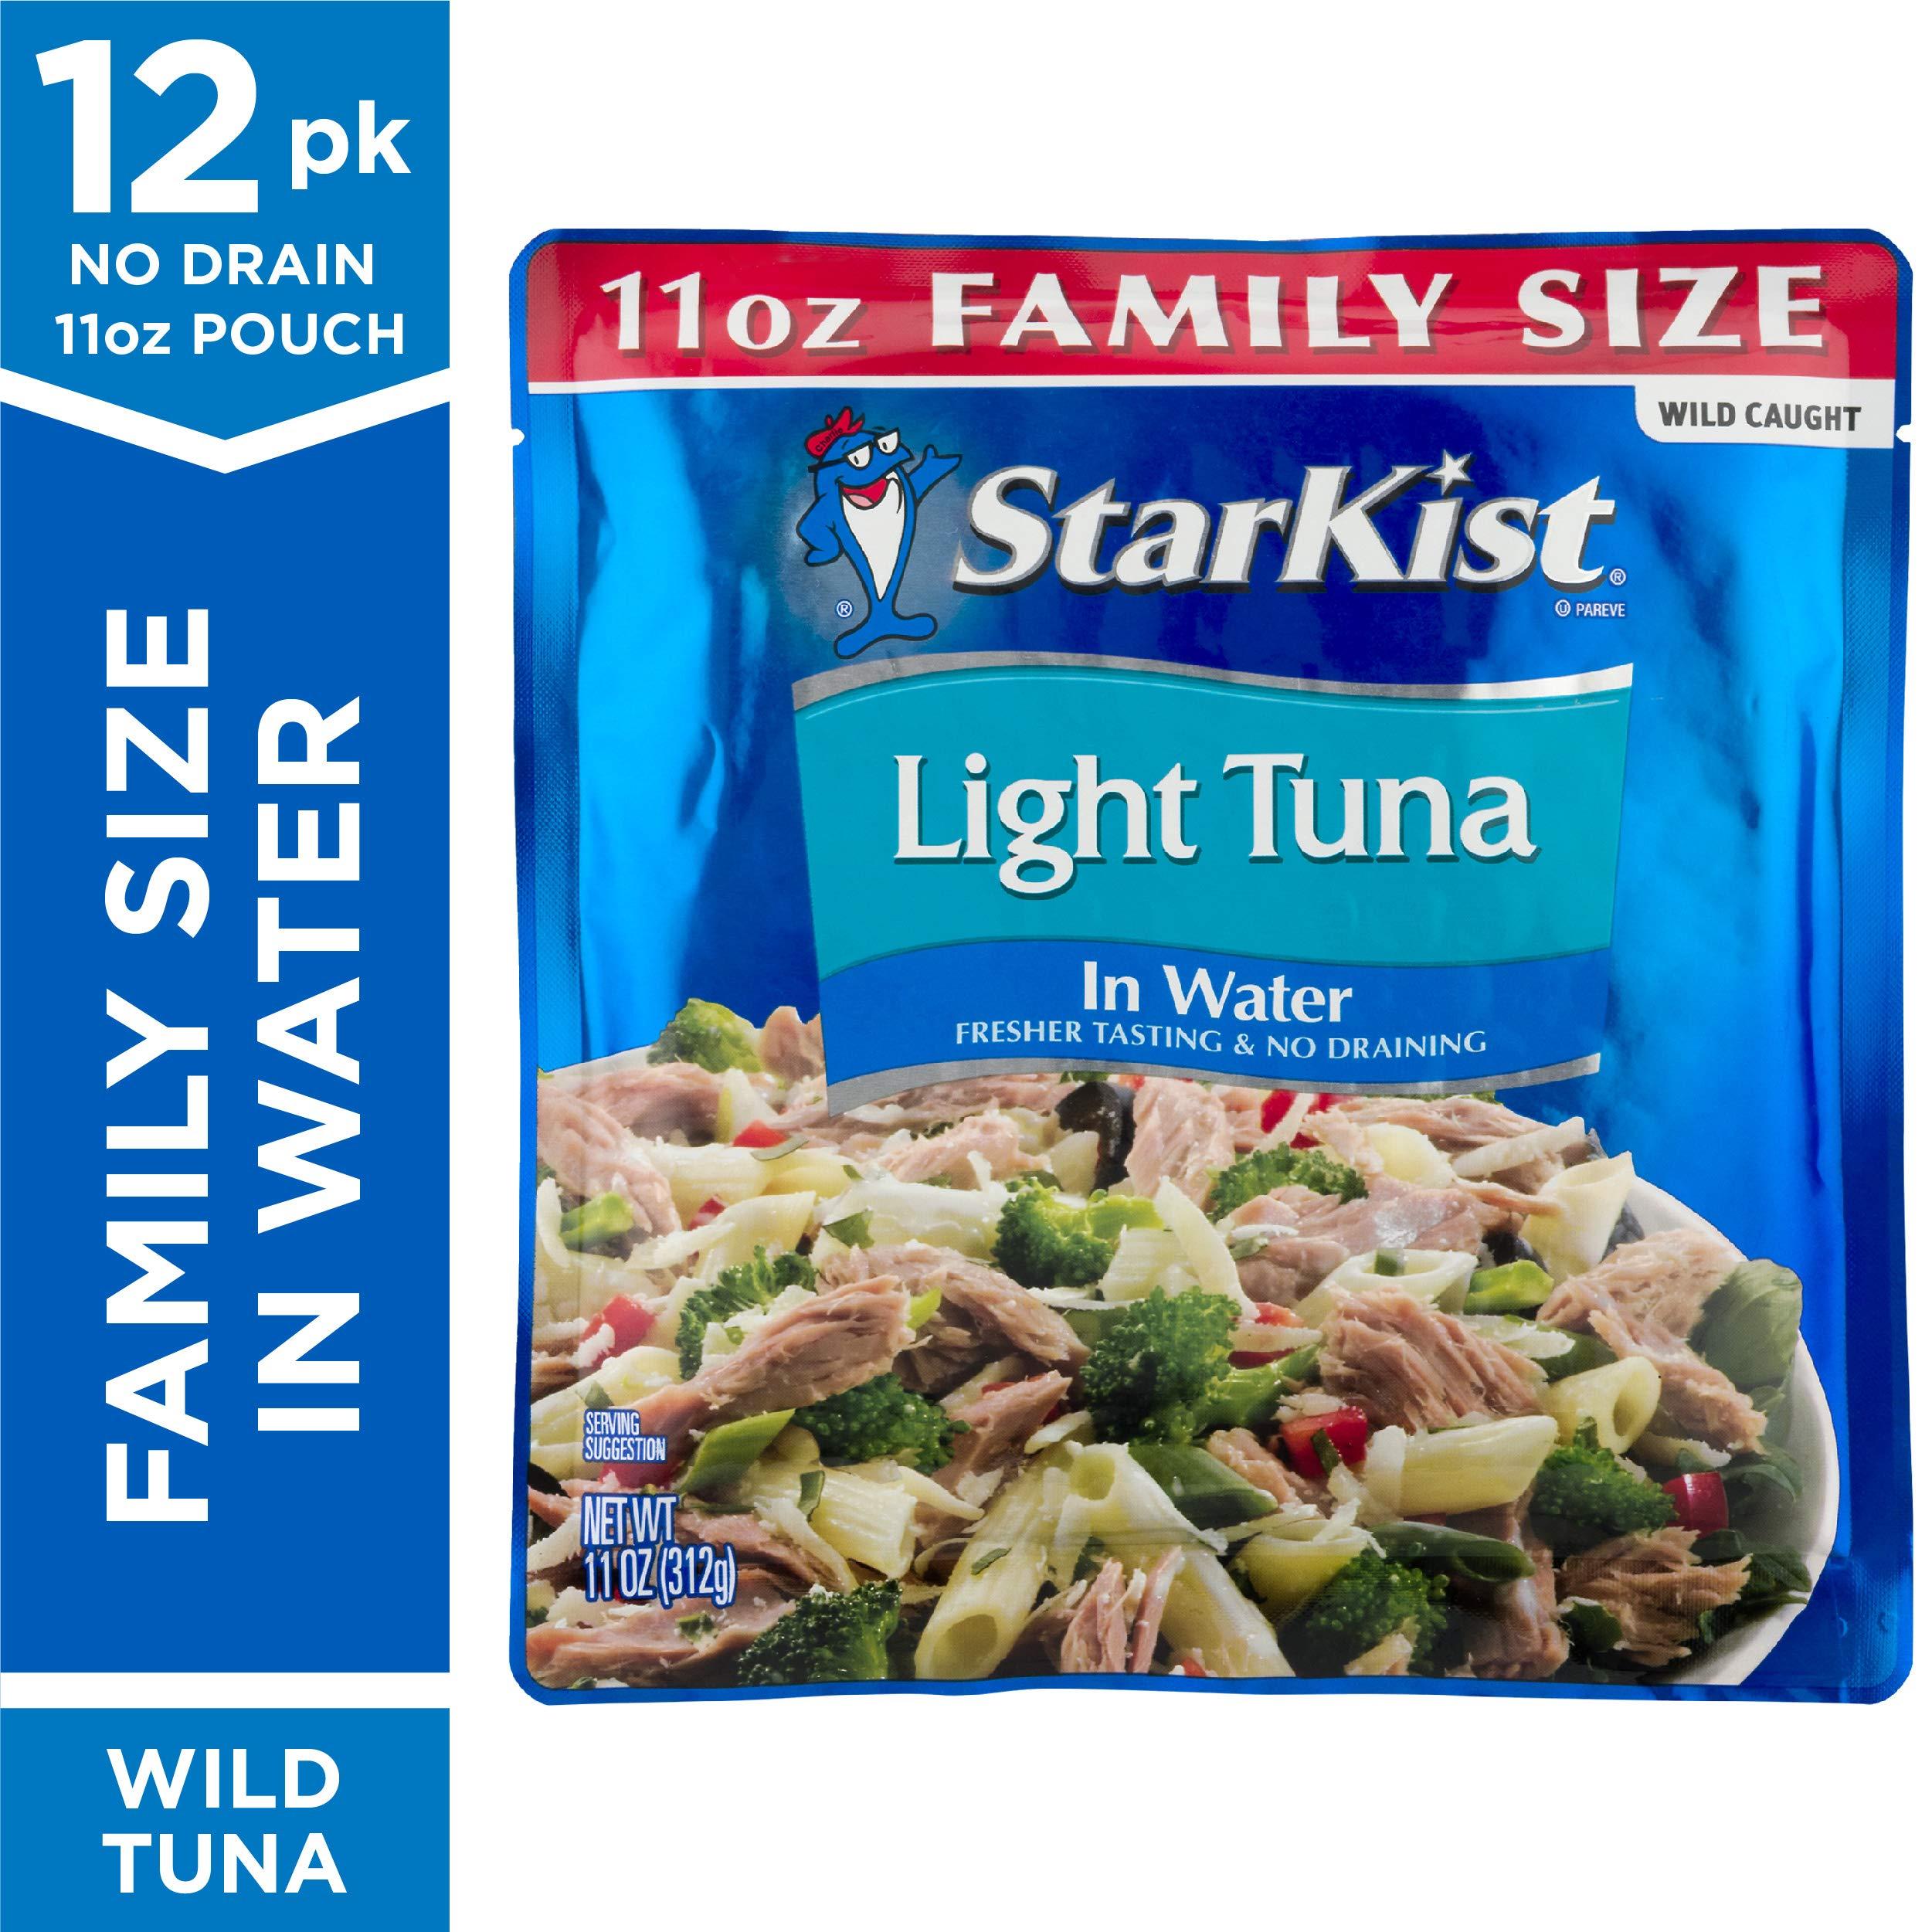 StarKist Chunk Light Tuna in Water - 11 oz Pouch (Pack of 12) by StarKist